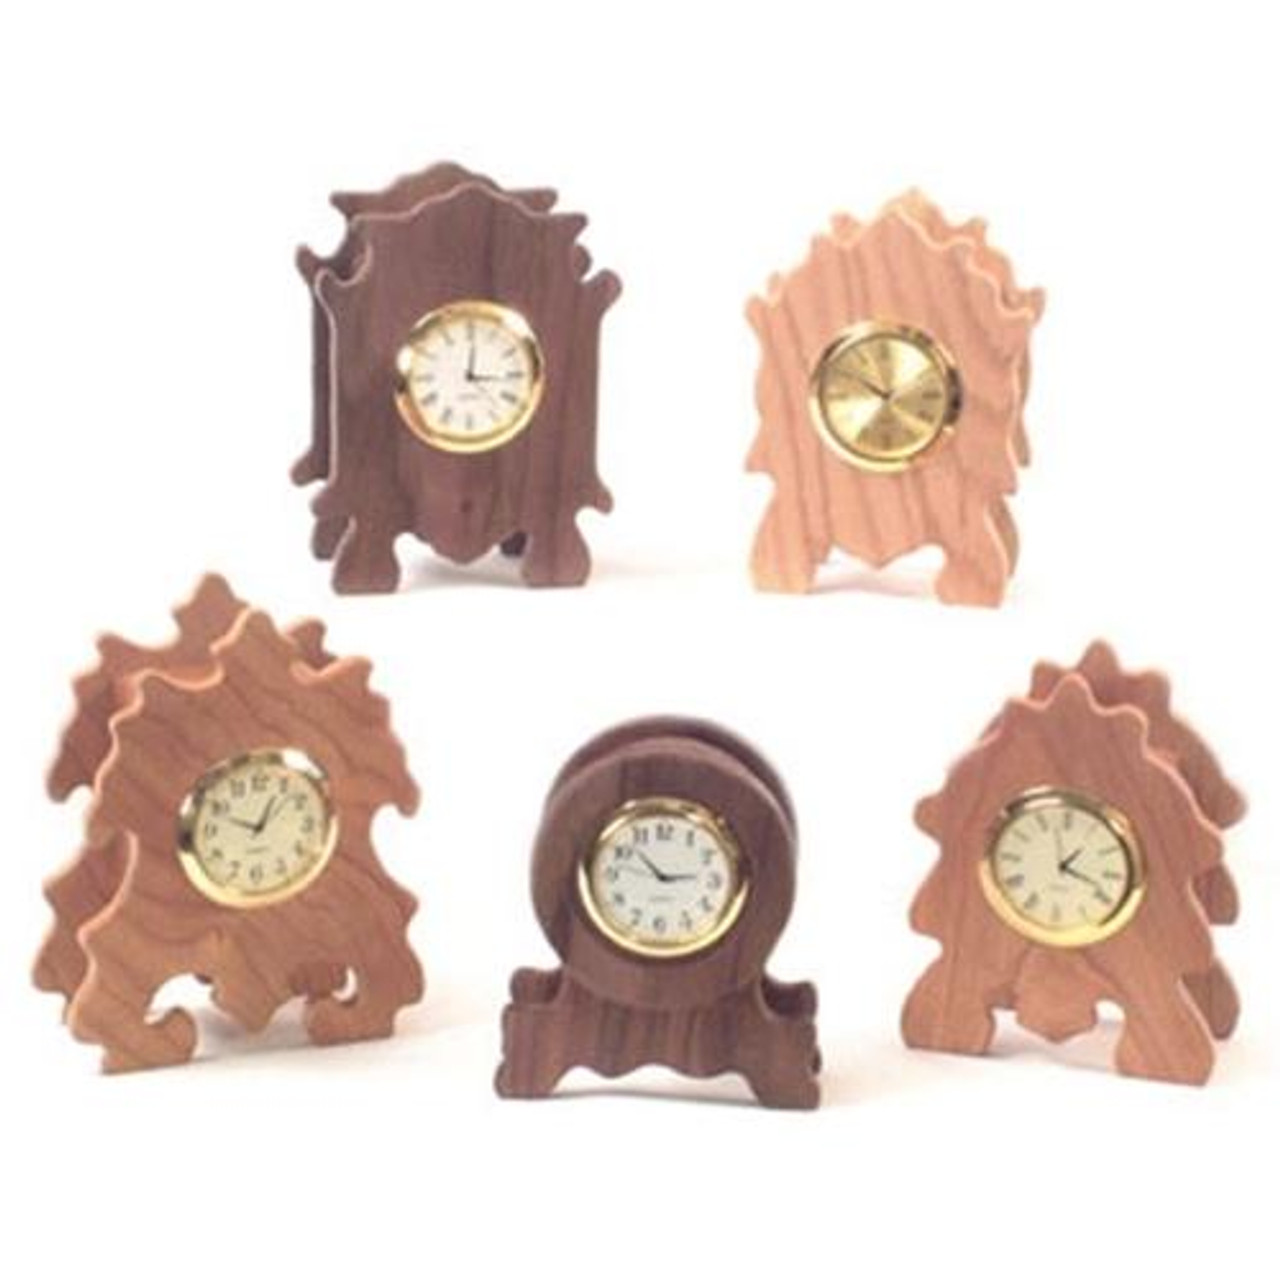 Cherry Tree Toys Mini Hardwood Clocks Plan